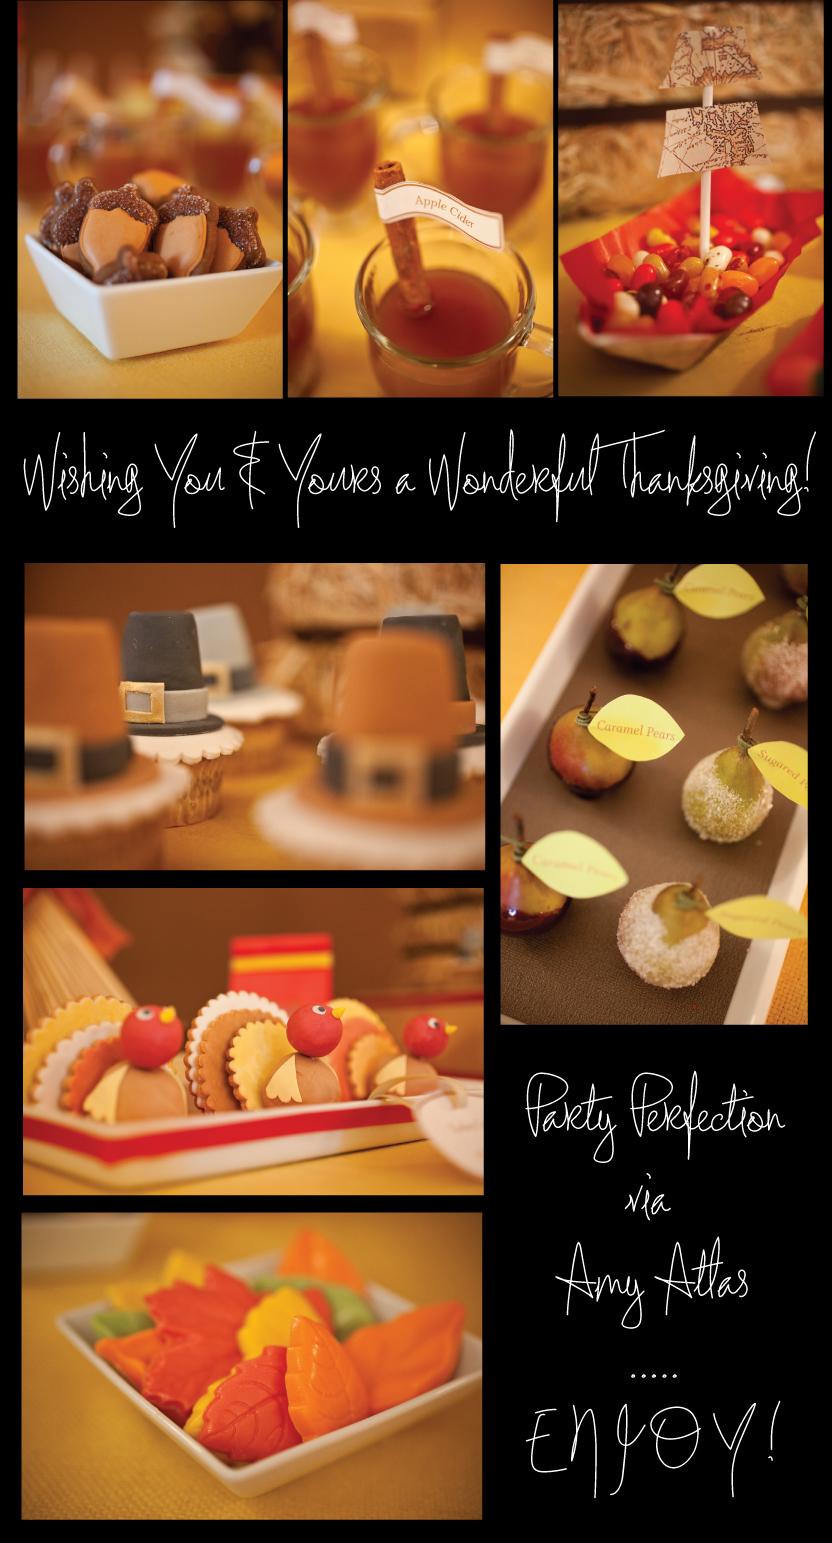 Amy Atlas Thanksgiving